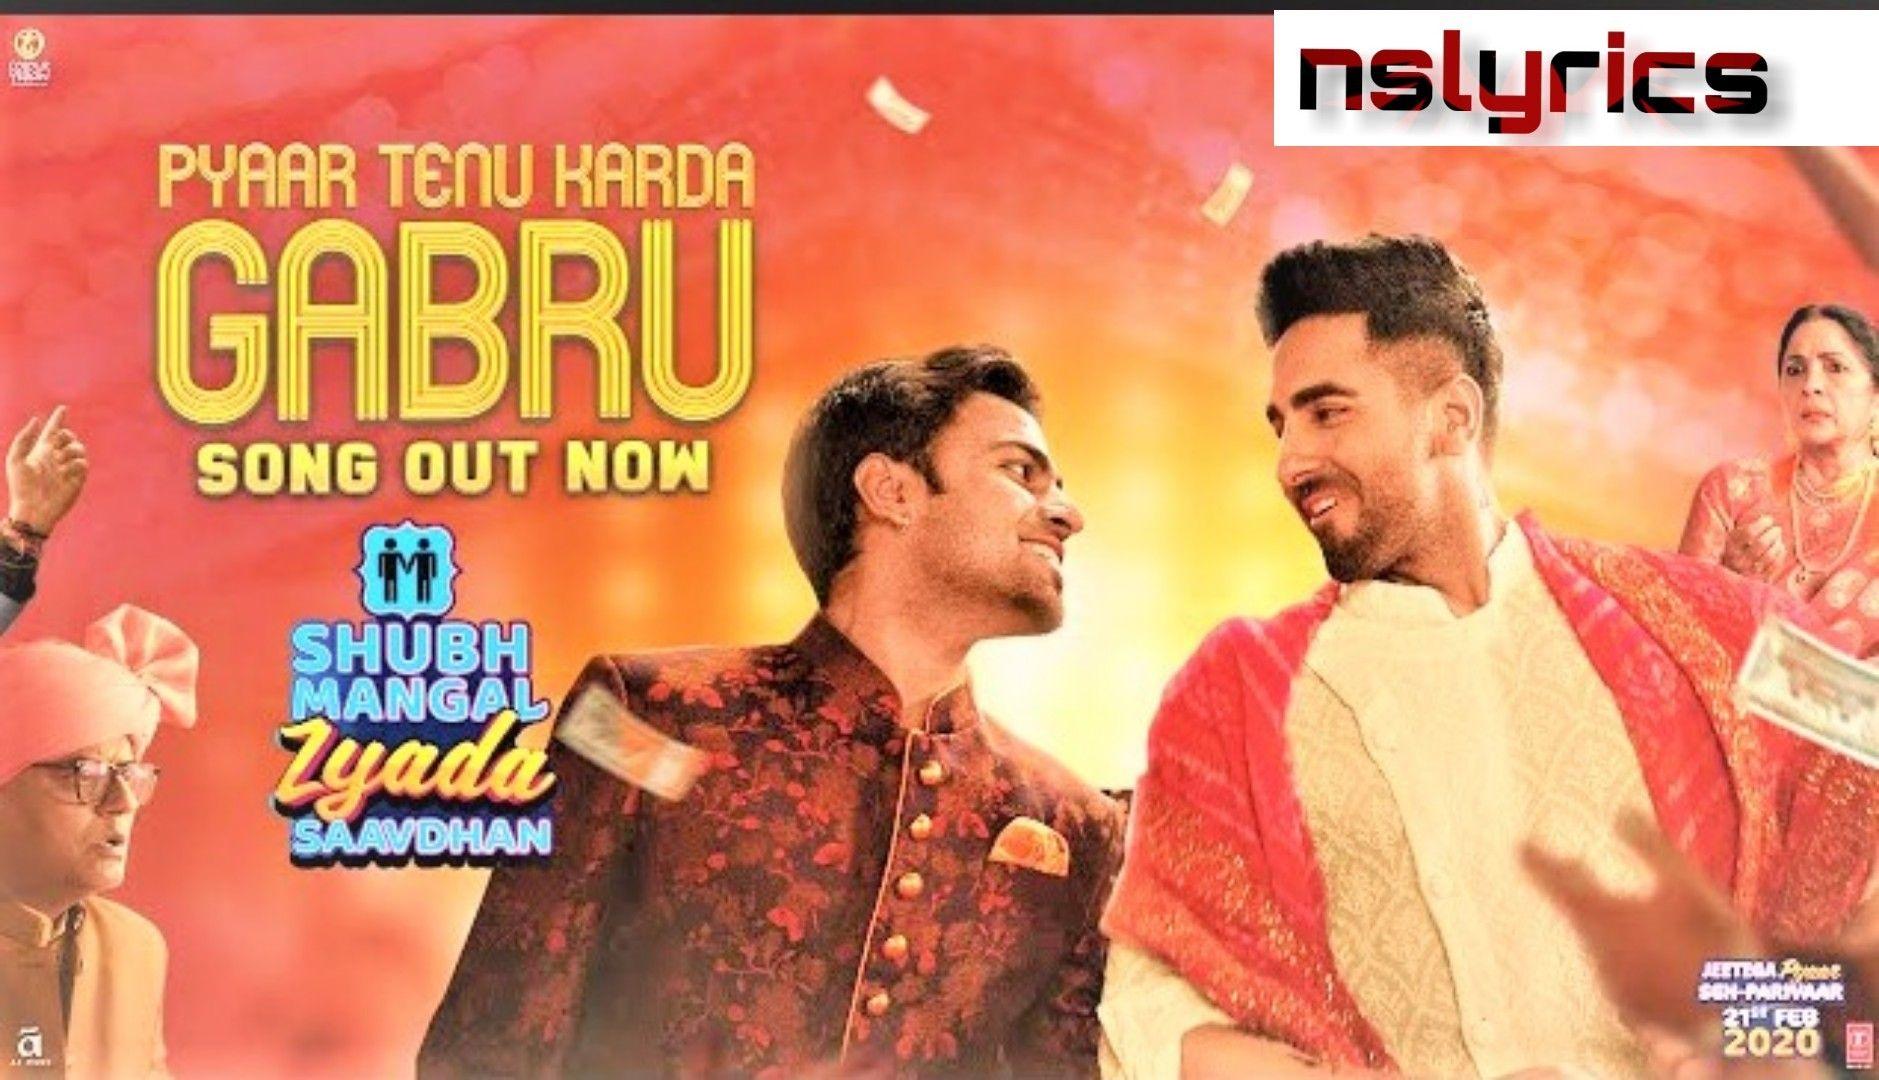 Pyar Tenu Karda Gabru Song Lyrics Singer Romy Music Tanishk Bagchi Movie Shubh Mangal Zyada S Di 2020 Lagu Mixtape Maine